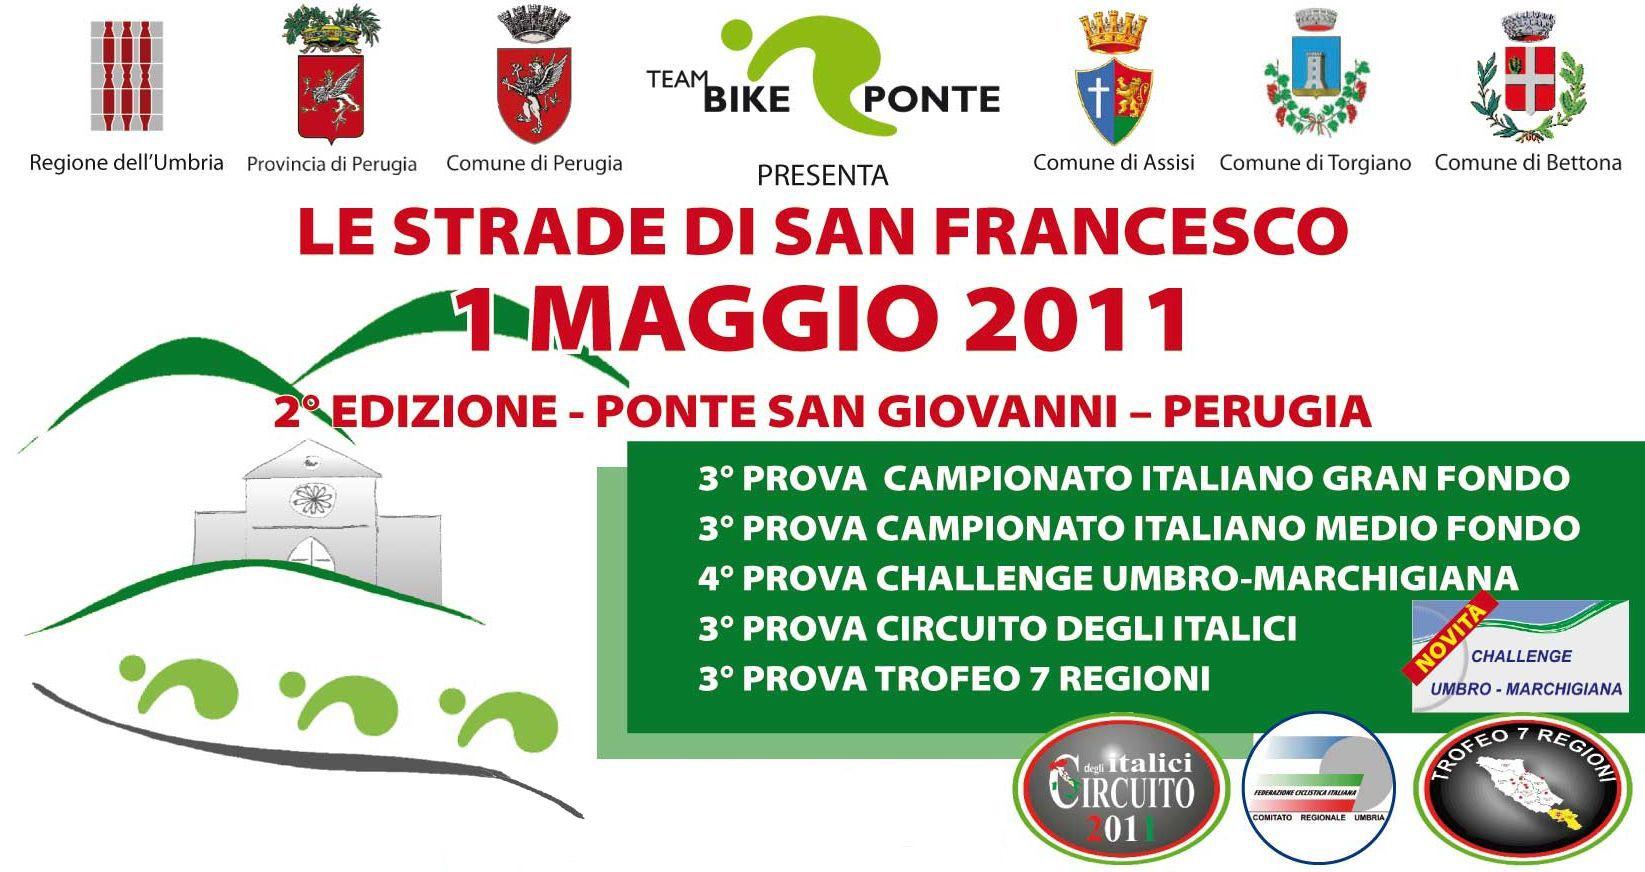 Gf Le Strade di San Francesco: appuntamento al 1 maggio